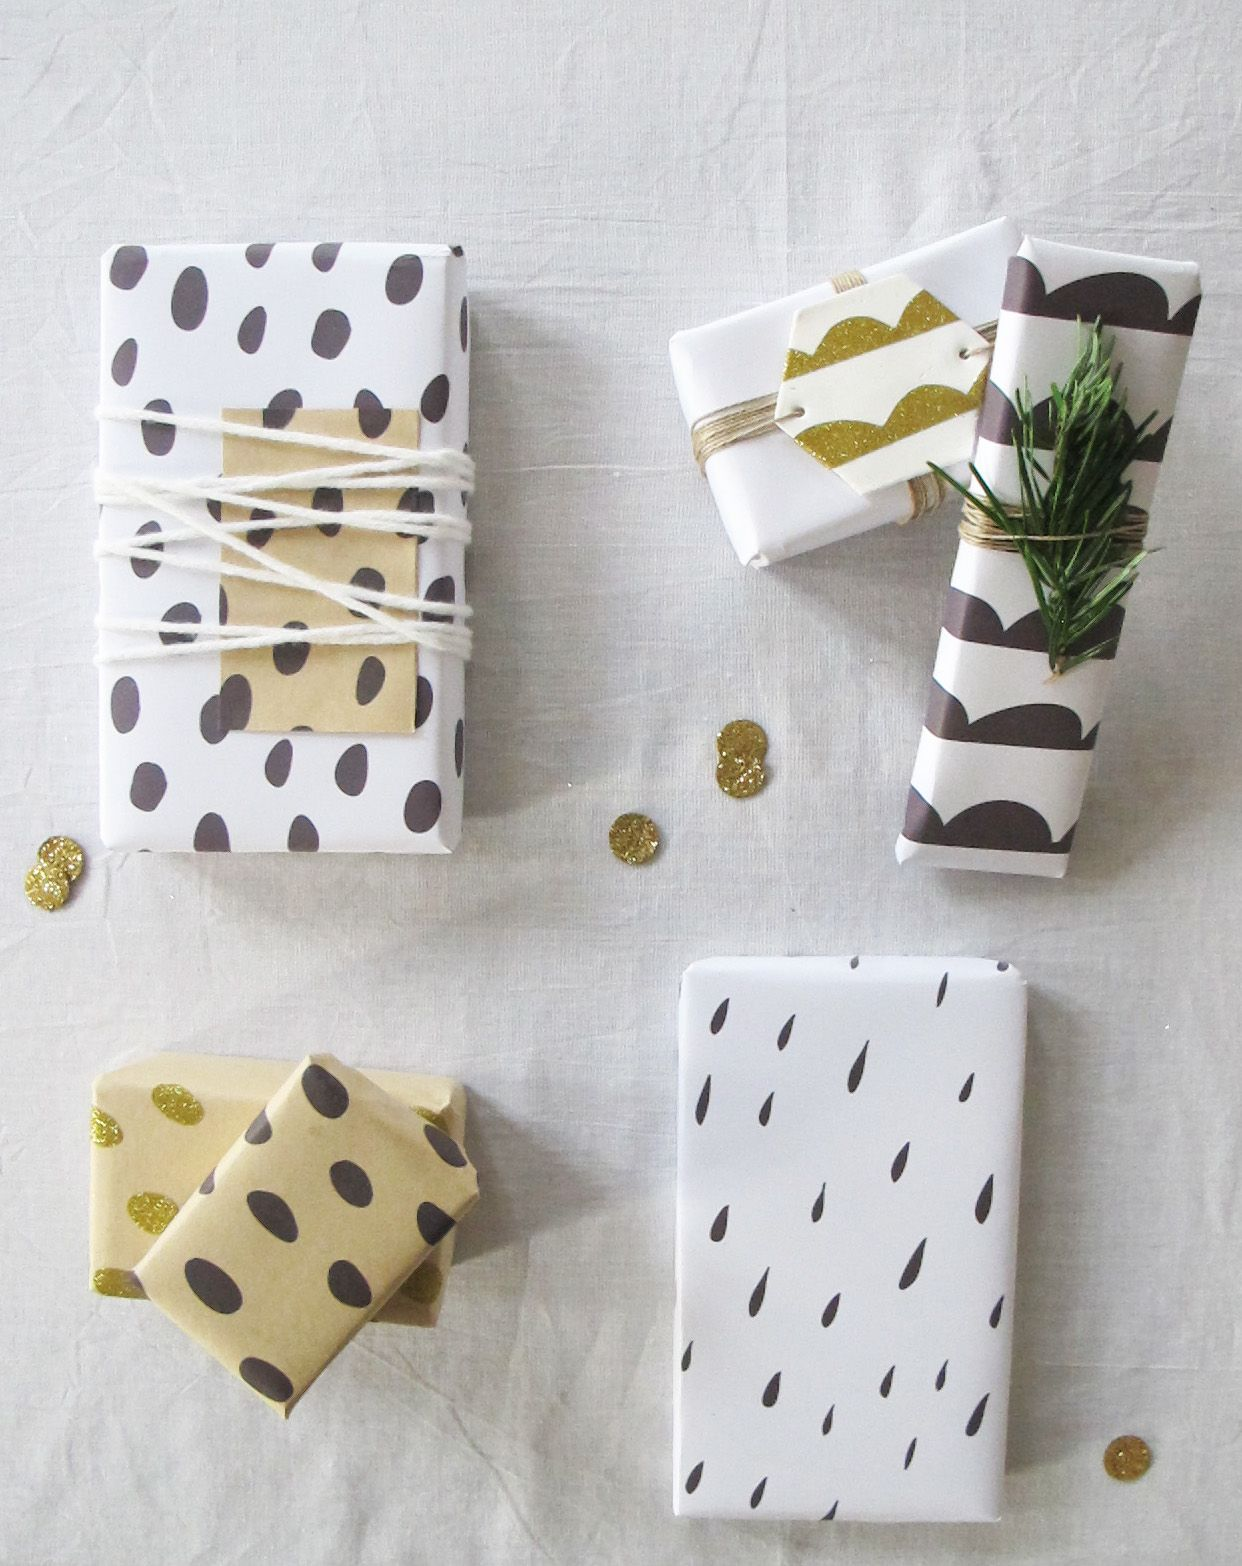 paquet cadeau noel 2015 p a c k a g e s craft. Black Bedroom Furniture Sets. Home Design Ideas